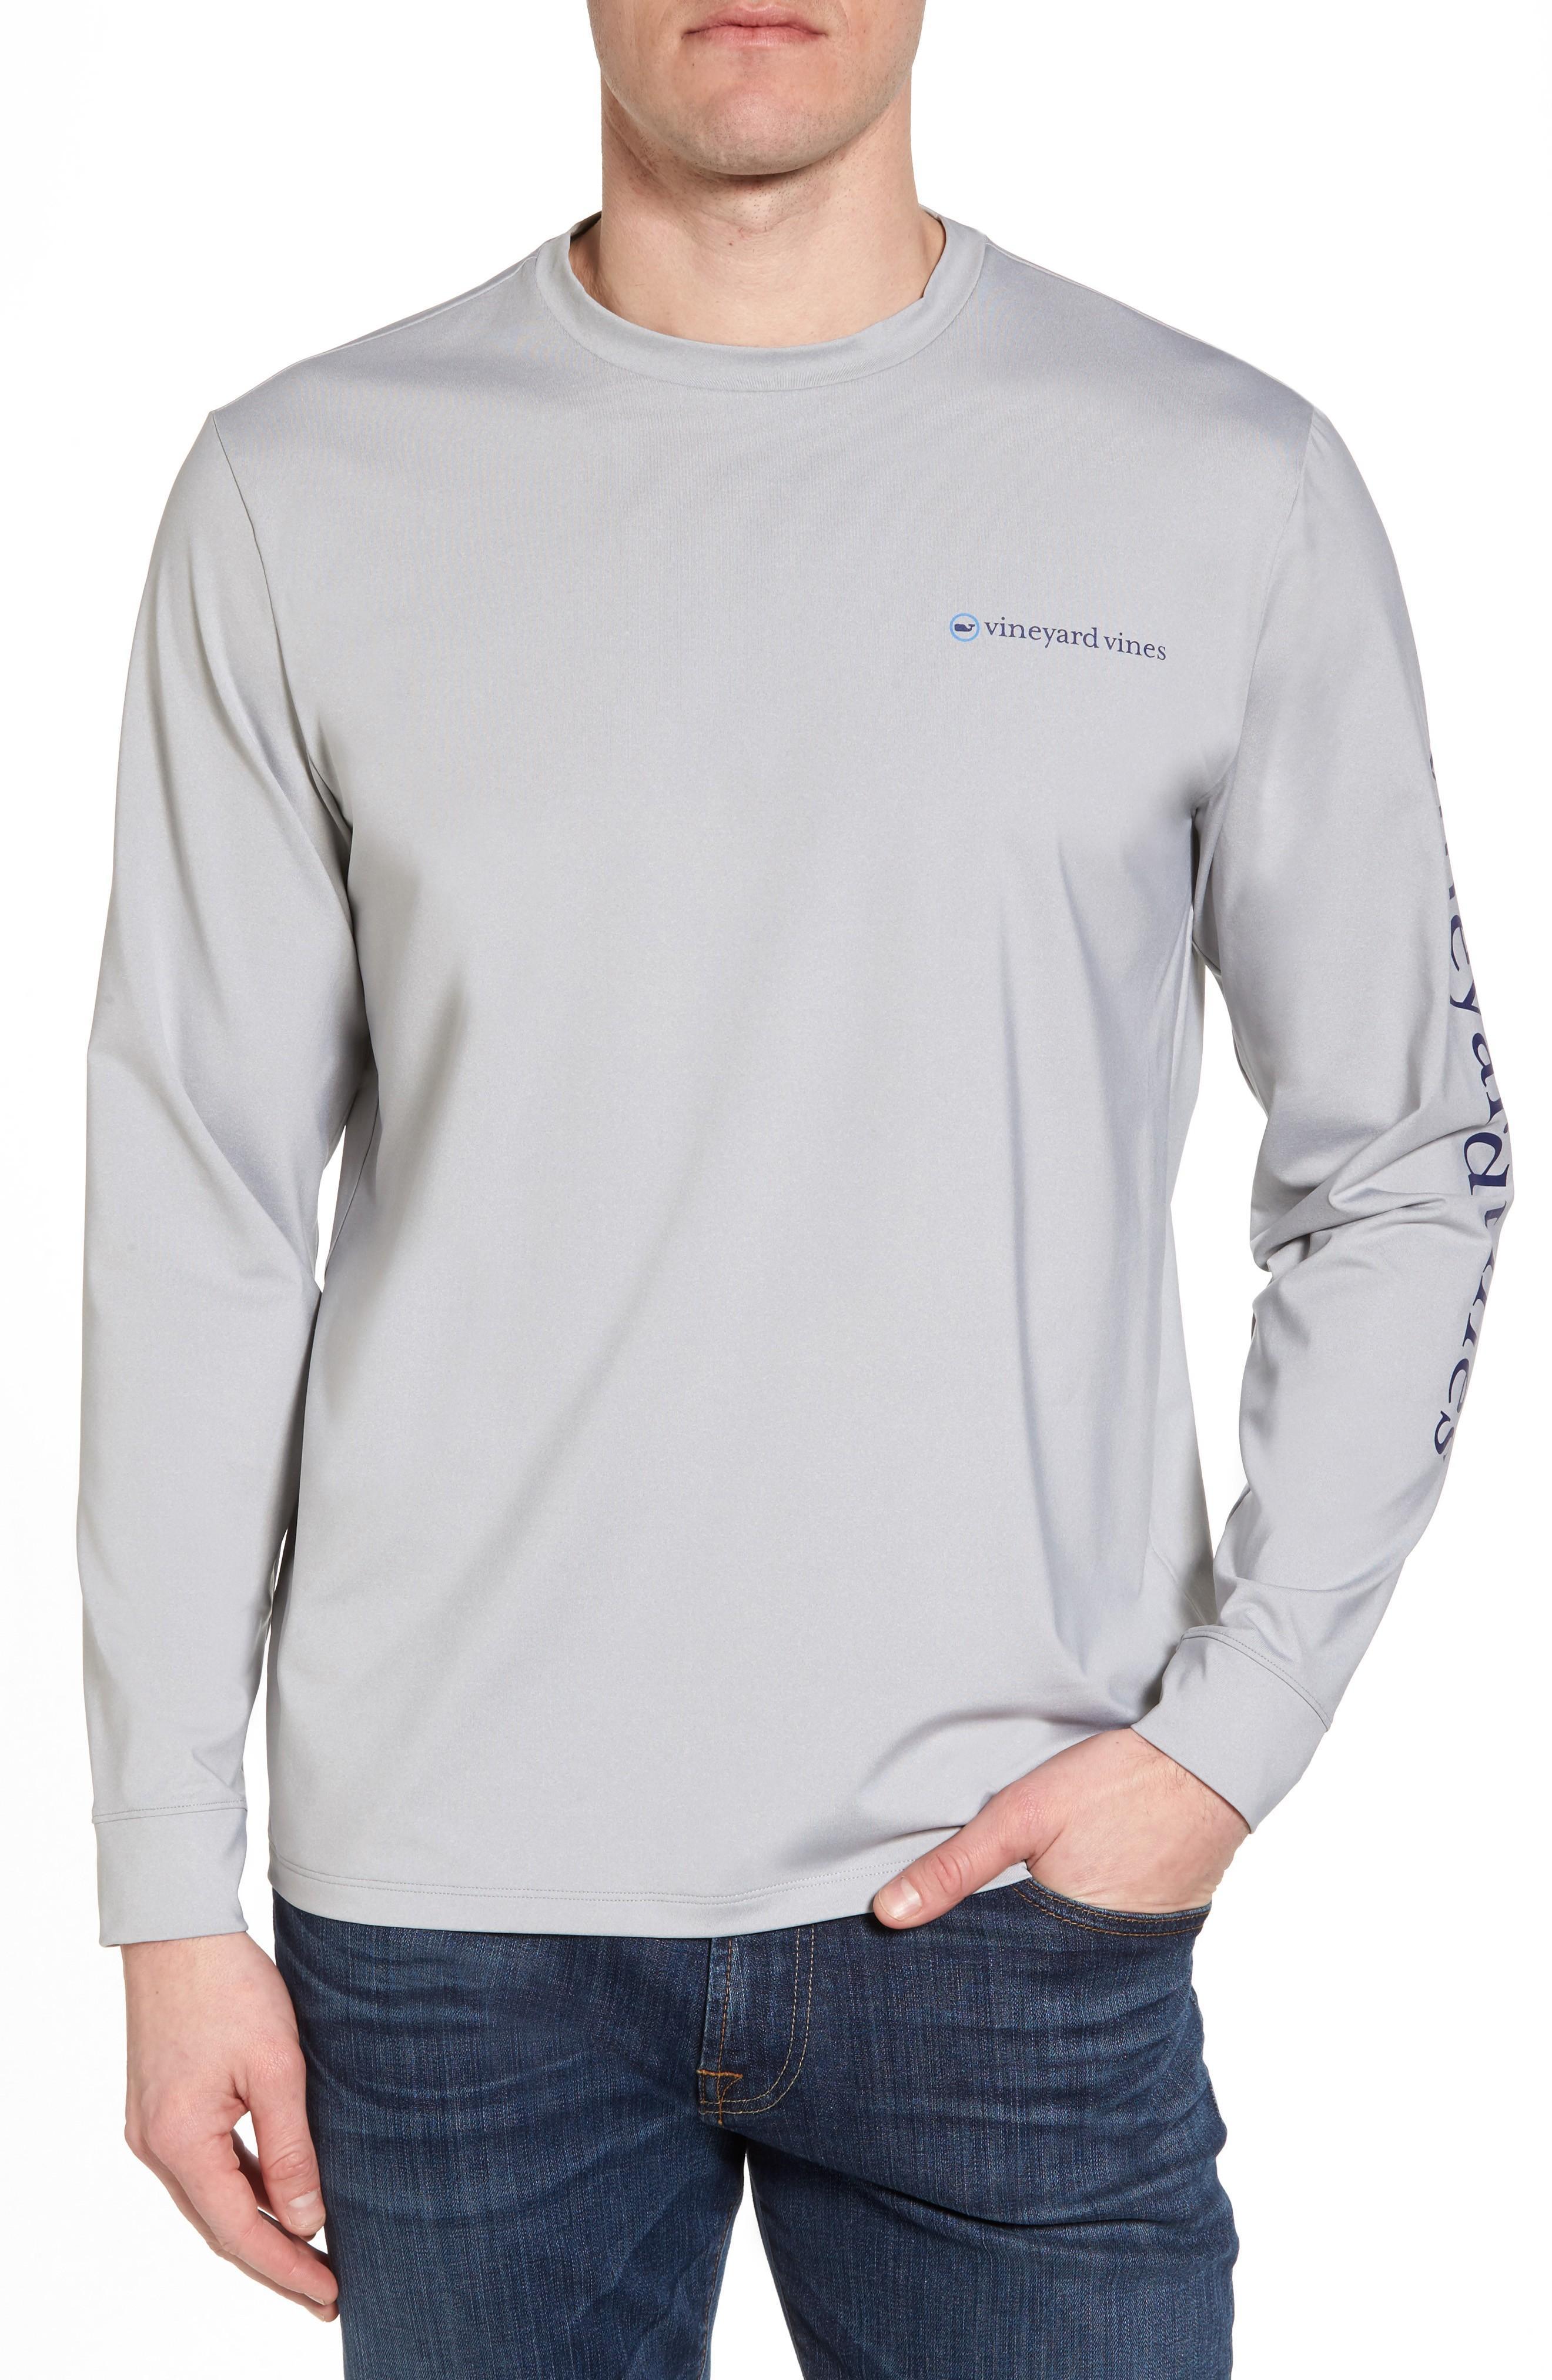 Vineyard Vines Heathered Long Sleeve Performance T-shirt In Gray Heather